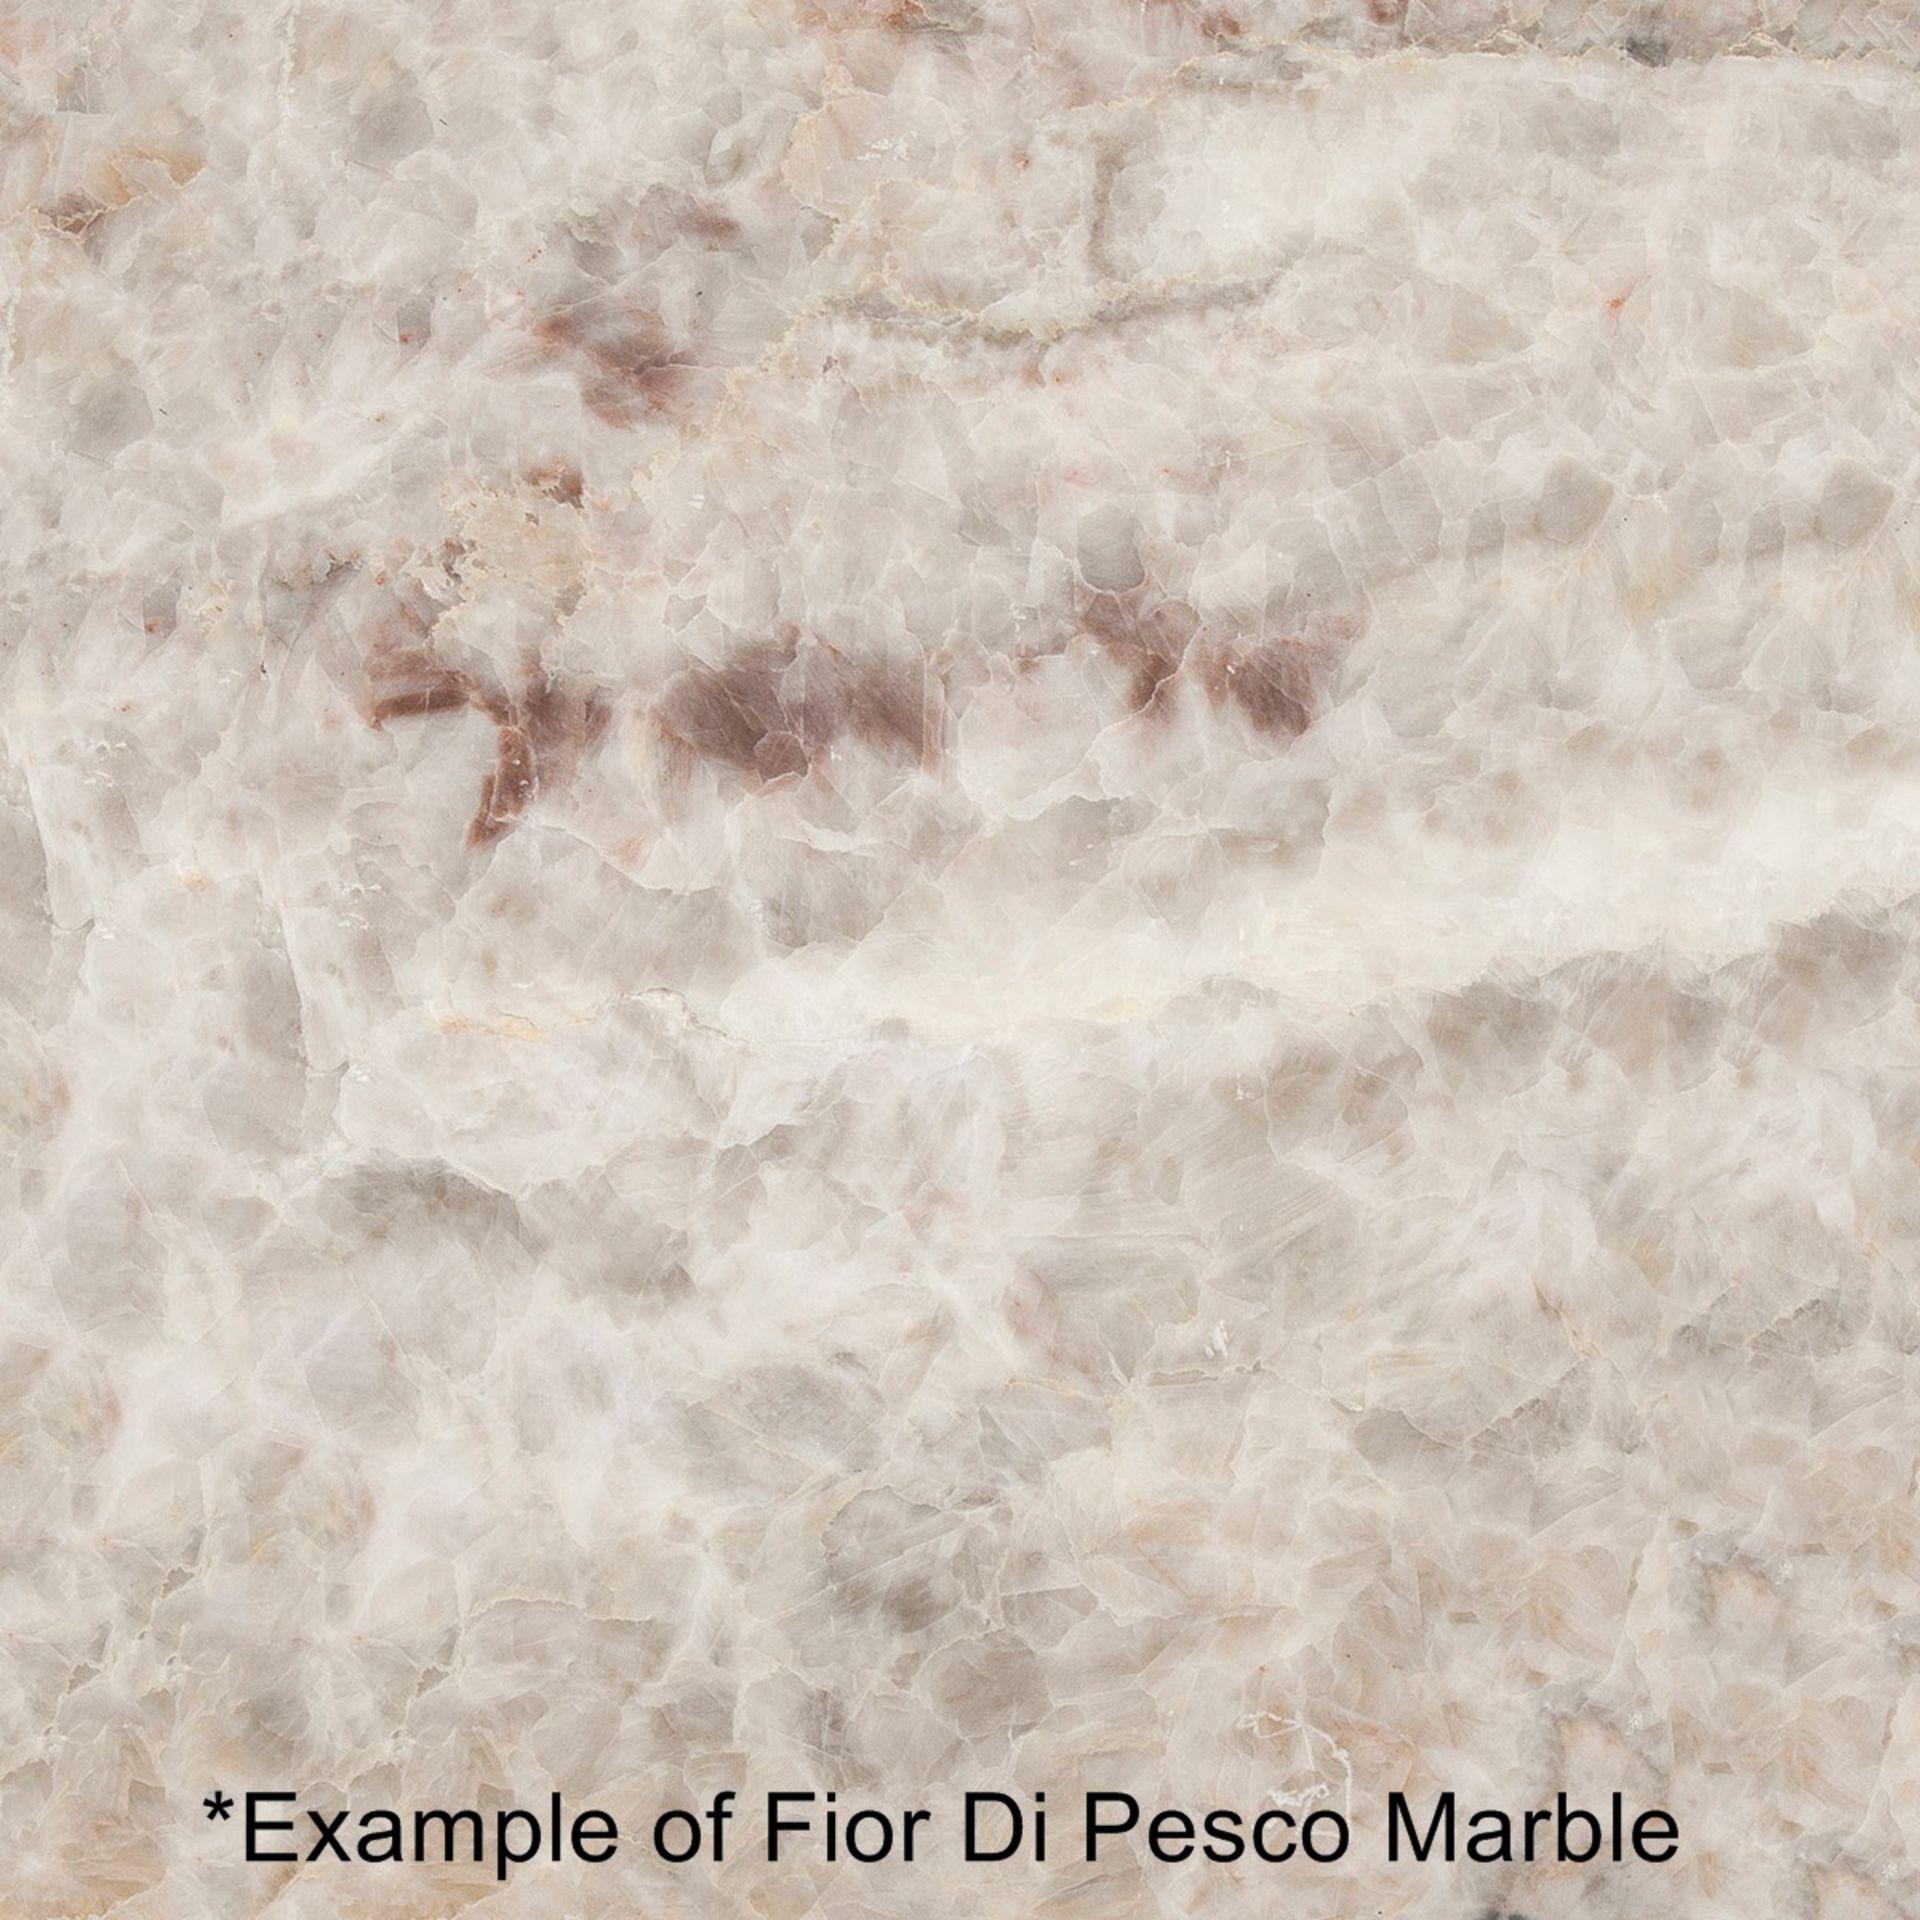 1 x POLTRONA FRAU 'Othello' Fior Di Pesco 2.6 Metre Long Marble Table Top - Dimensions: 260x100cm - Image 4 of 6